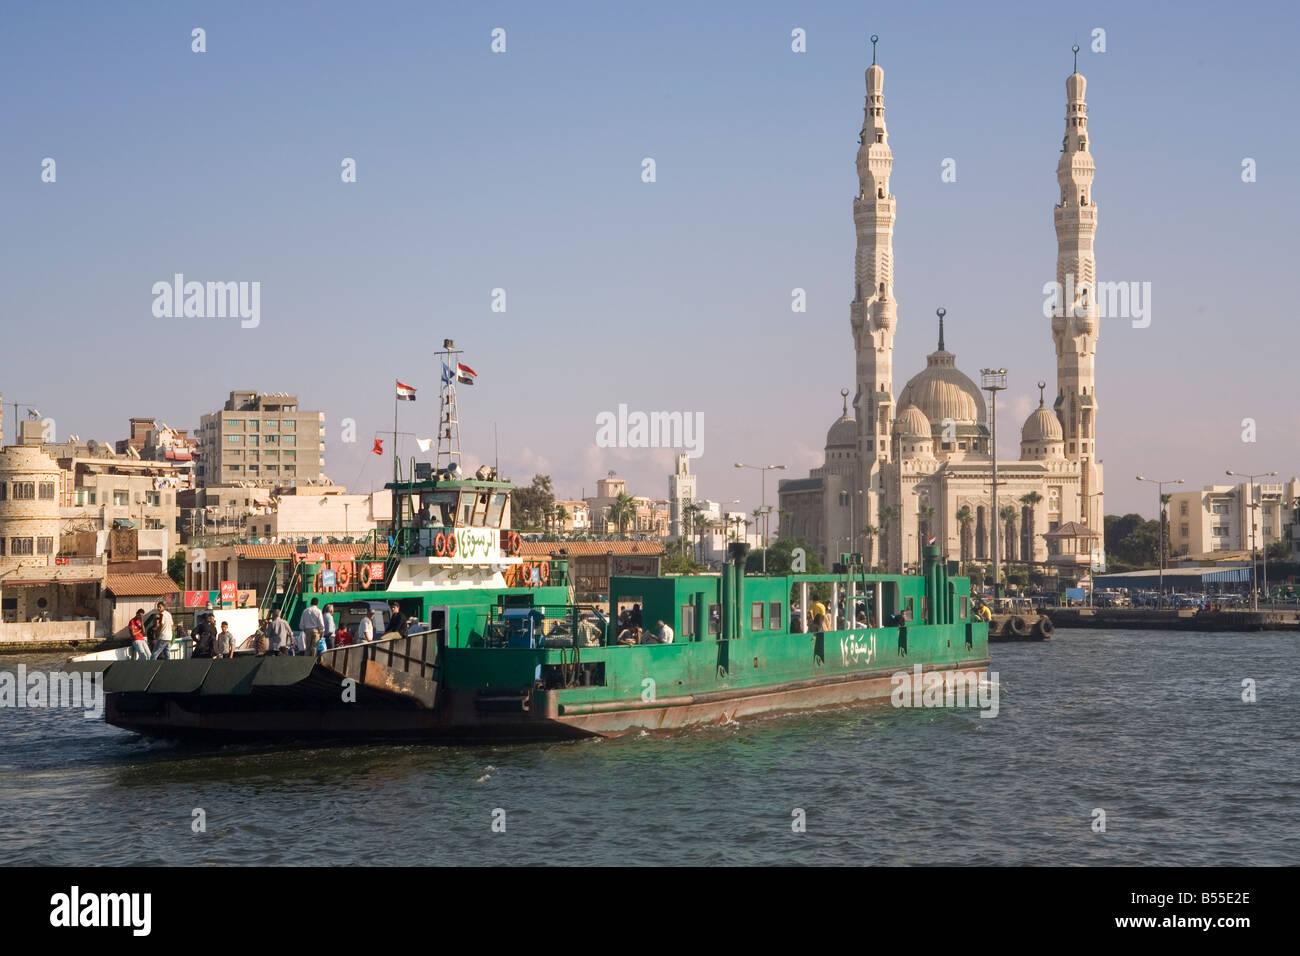 Egypt port said ferry across suez canal to port fuad stock photo egypt port said ferry across suez canal to port fuad publicscrutiny Gallery